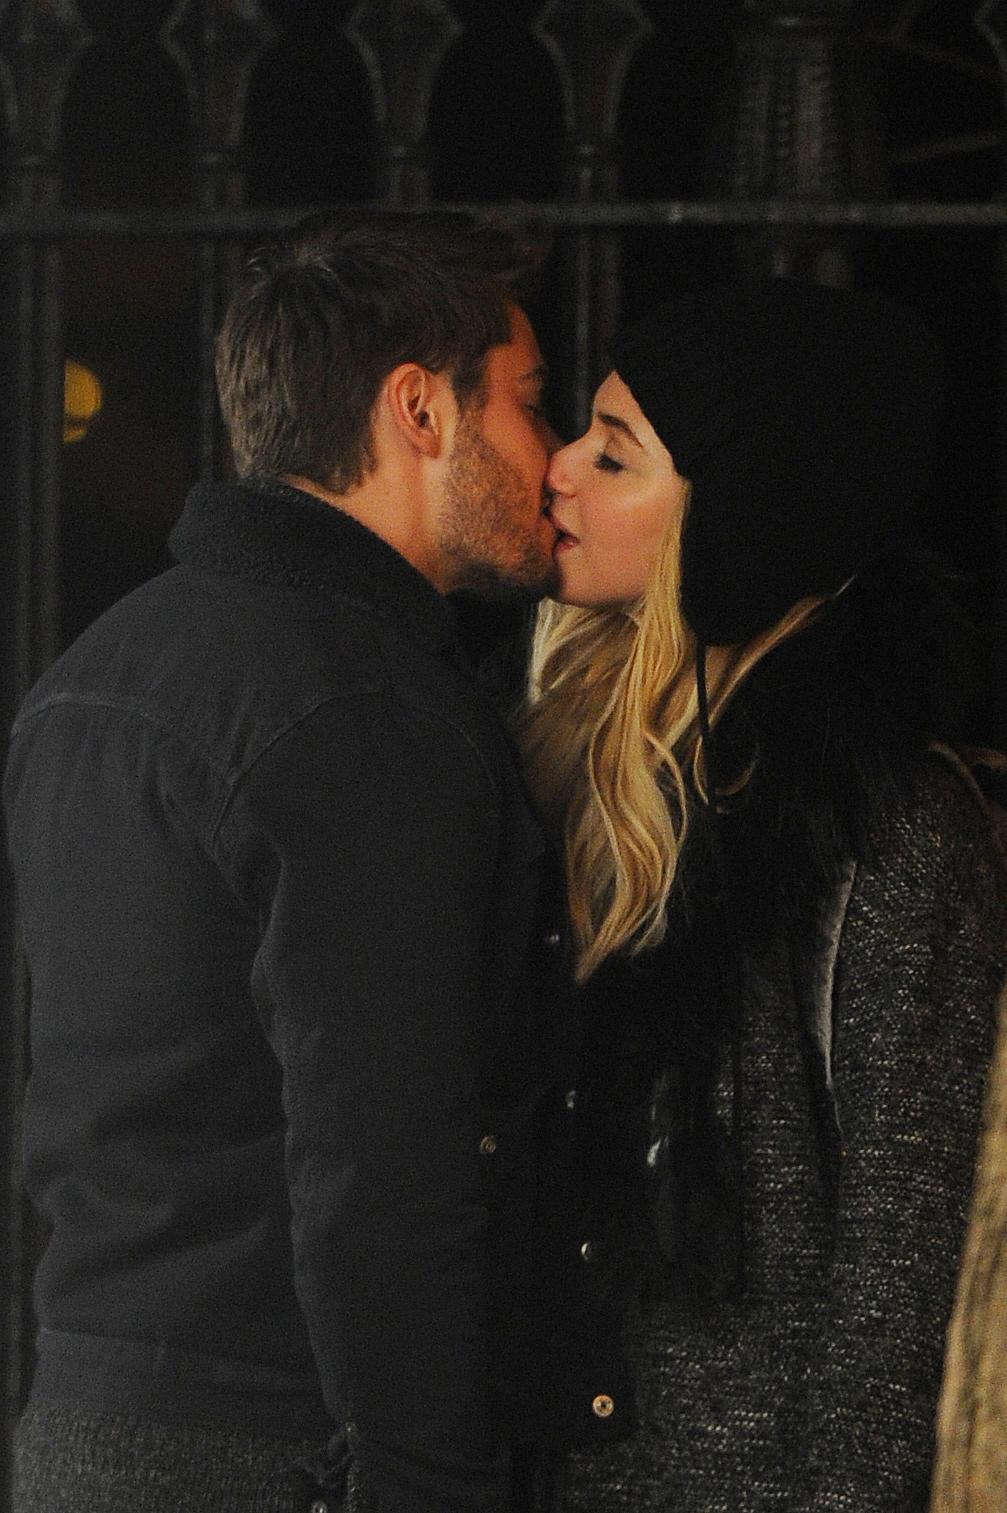 zac efron kiss